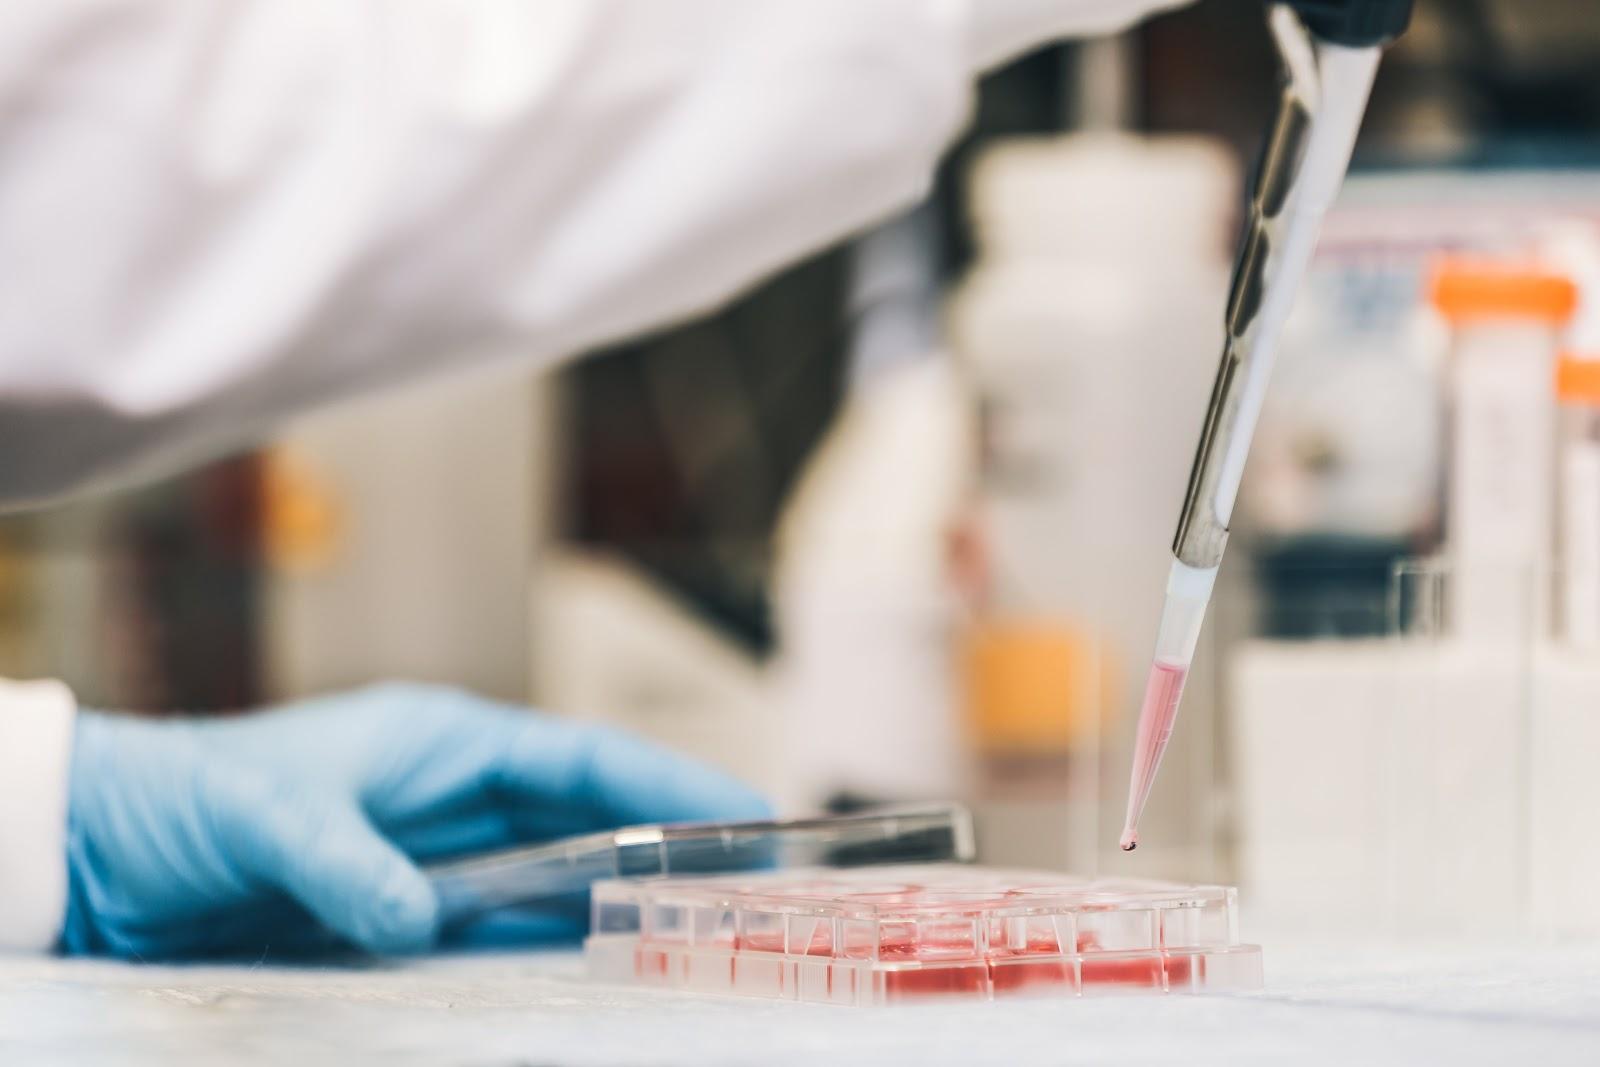 H.Pylori lab testing